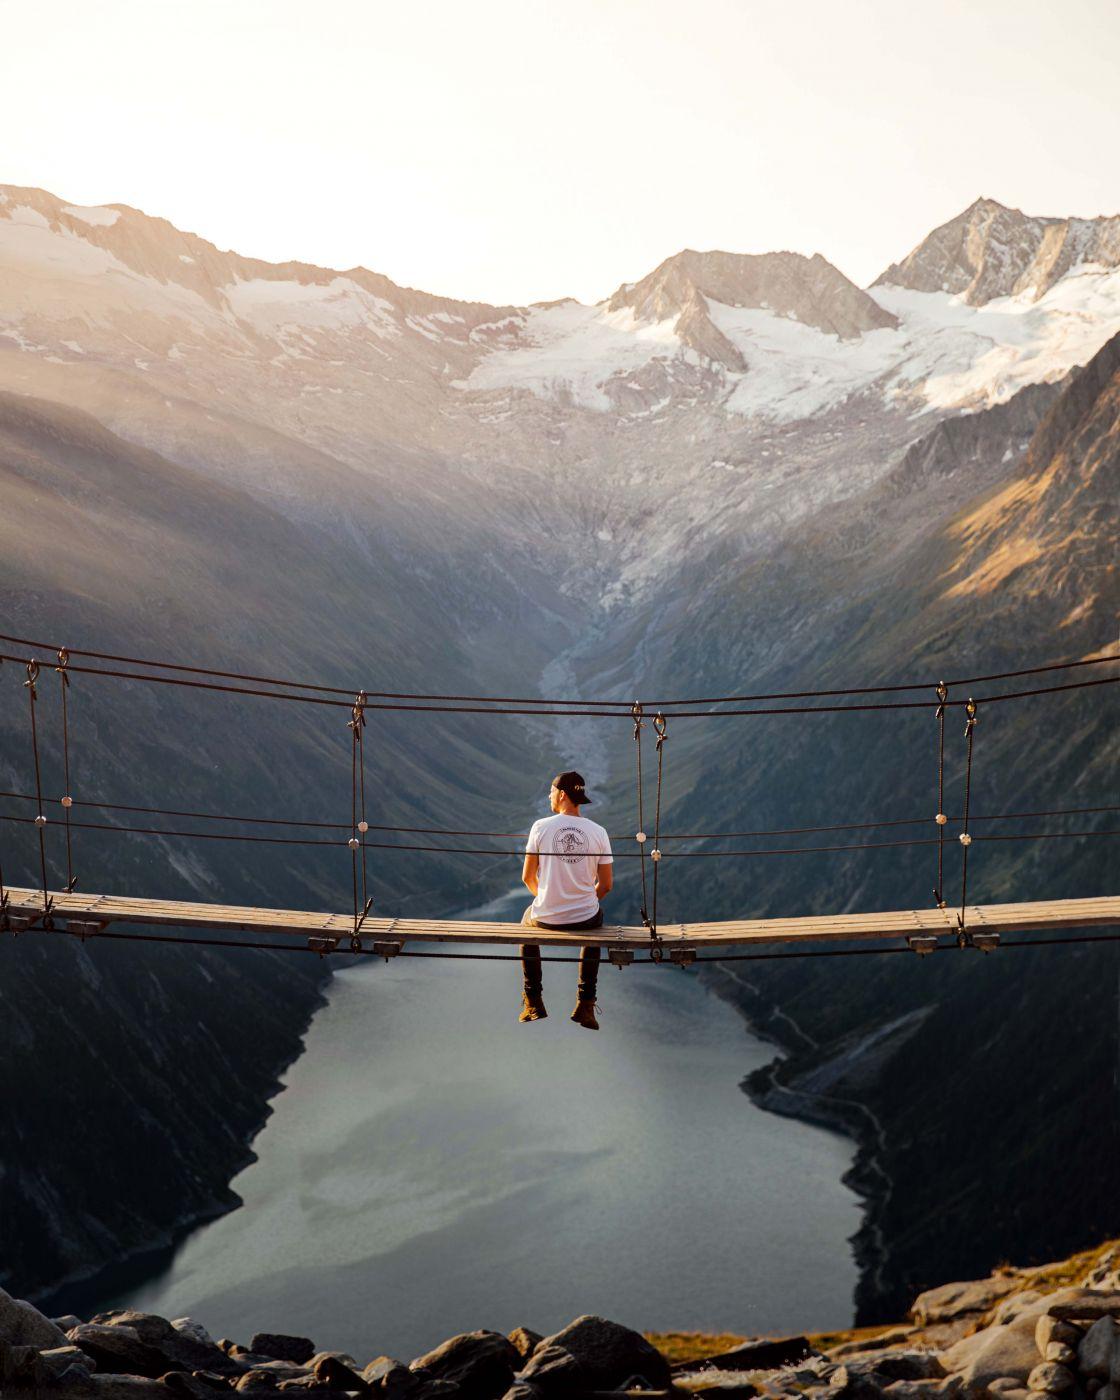 Olpererhütte Panorama Bridge, Austria